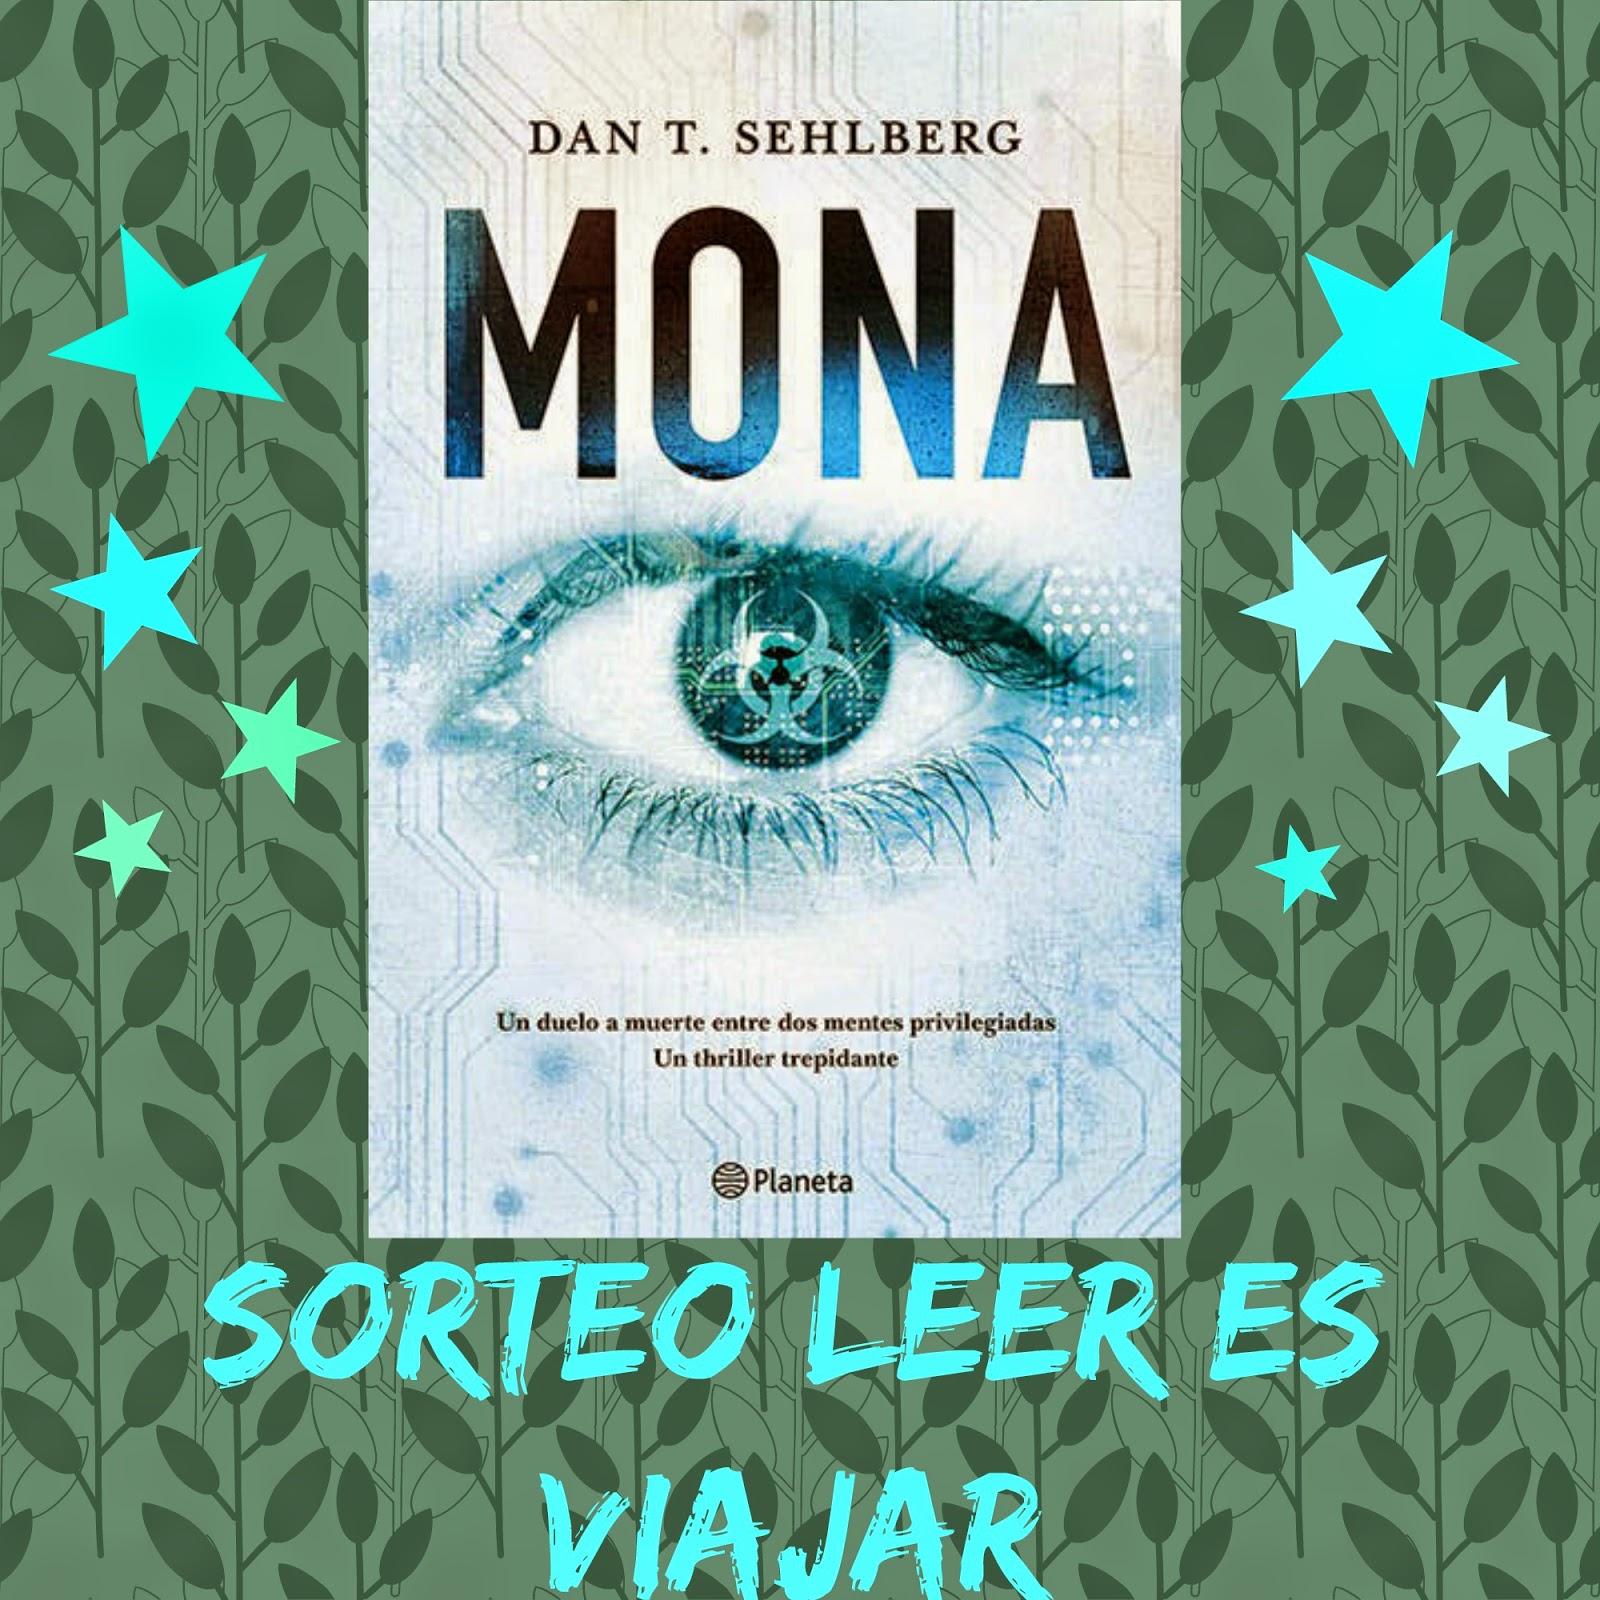 Sorteo Mona Editorial Planeta